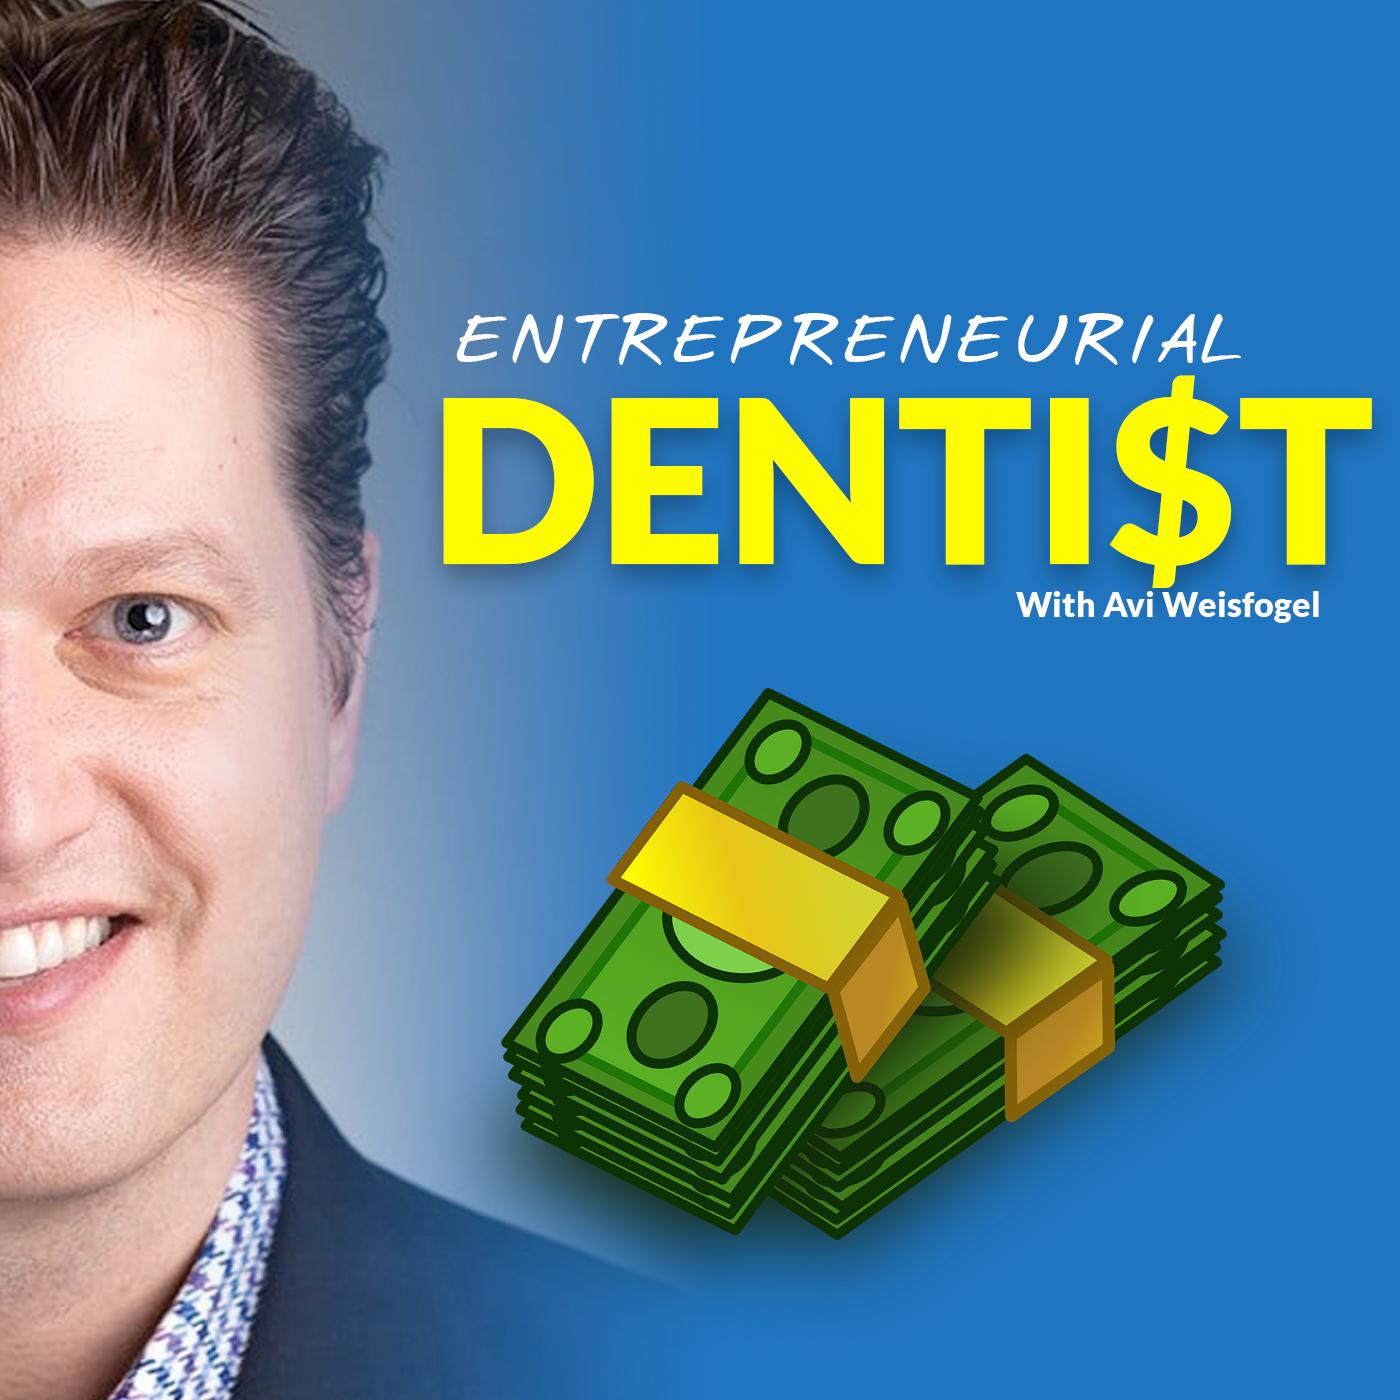 Entrepreneurial Dentist Podcast with Avi Weisfogel show art